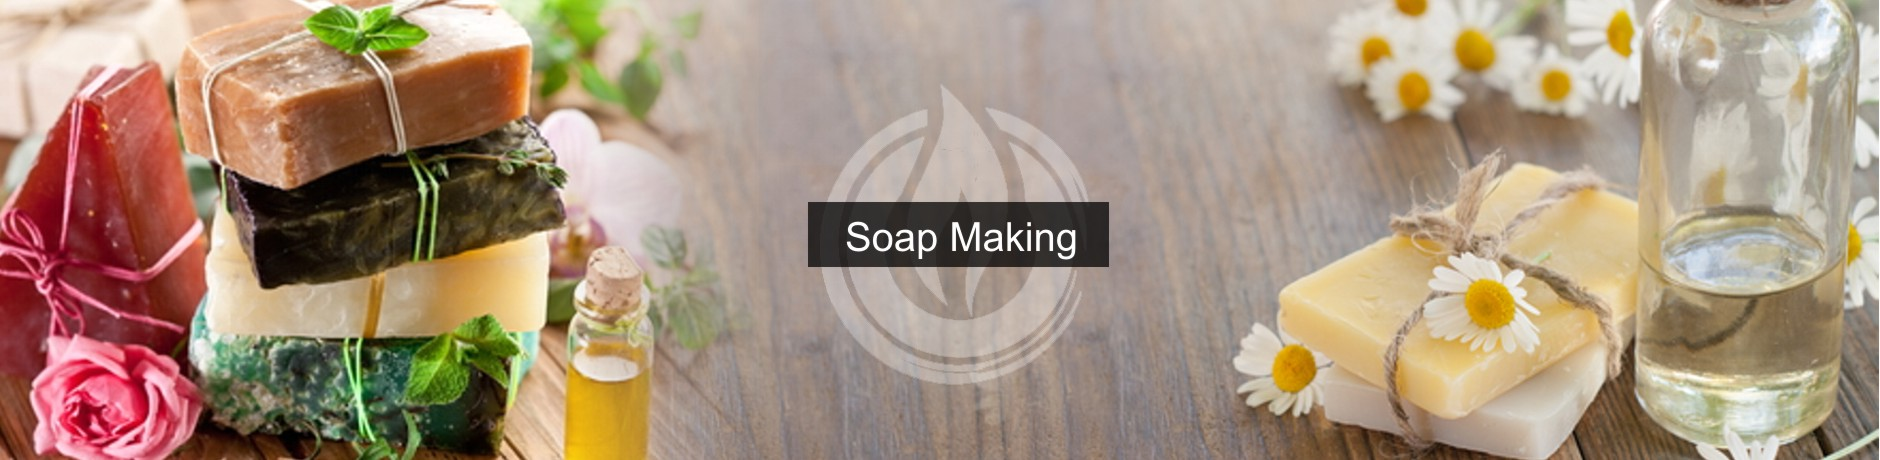 soap-making.jpg